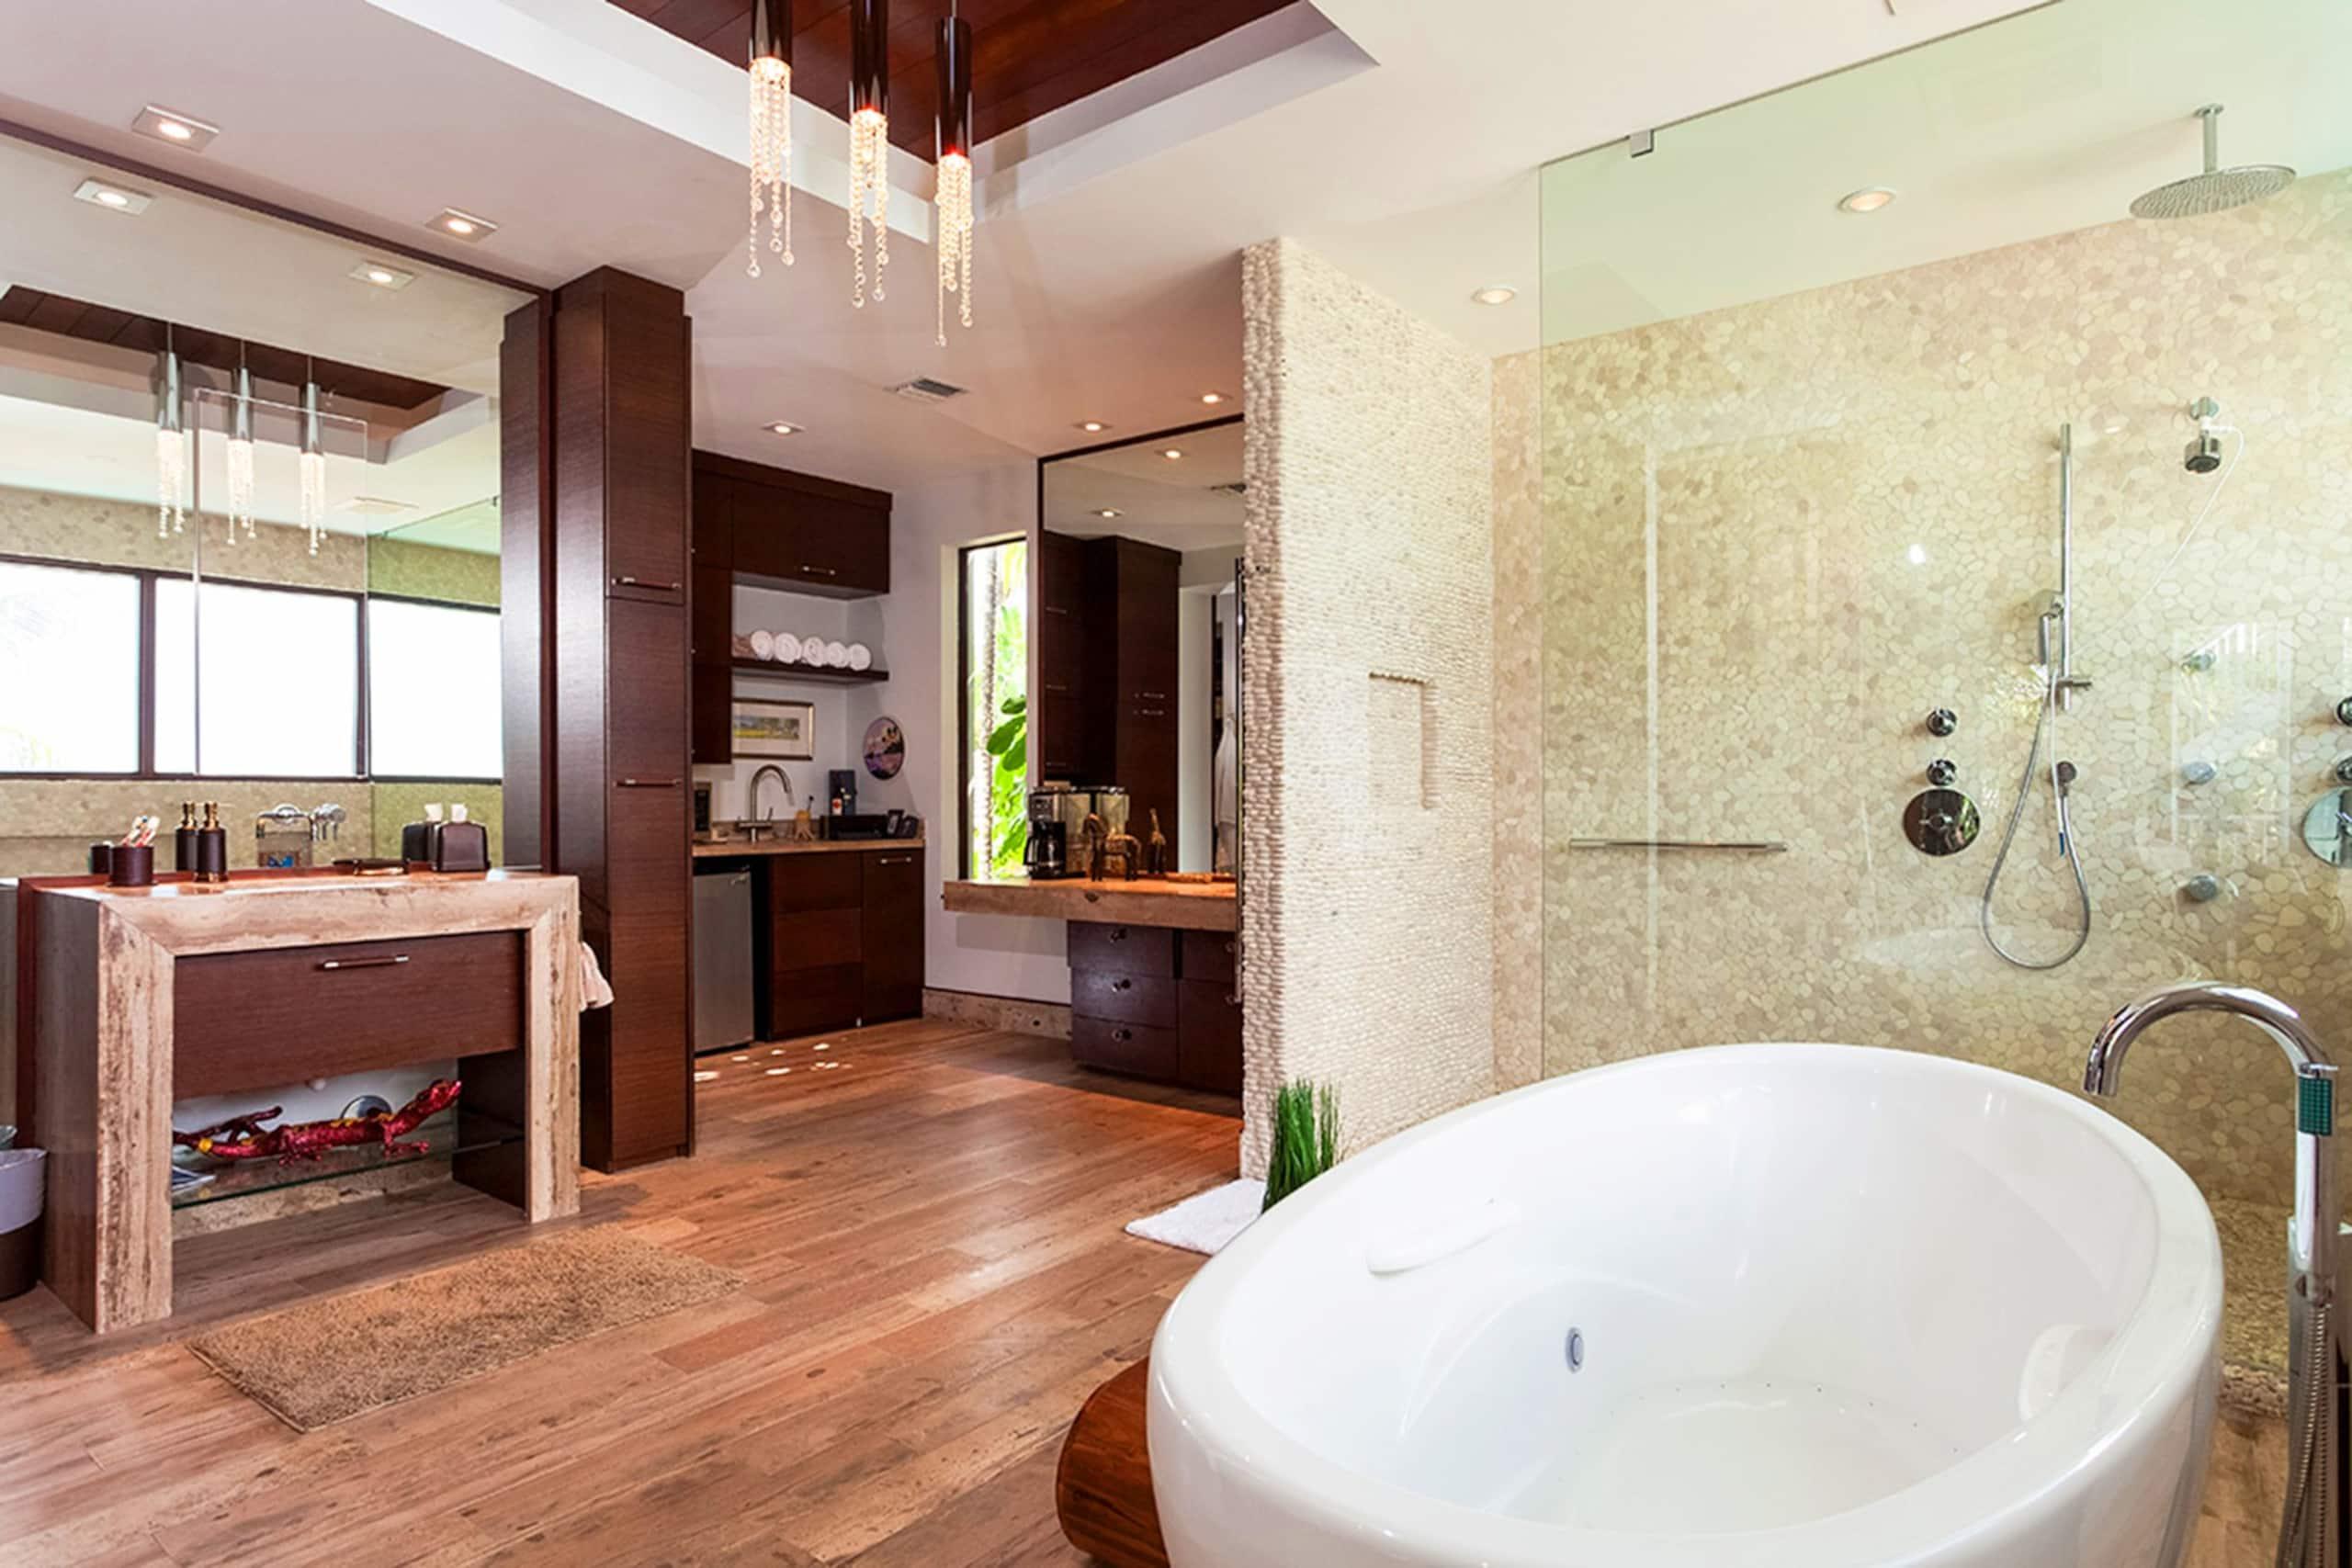 Apartment Villa Riza - Magnificent Balinese-style photo 19959226